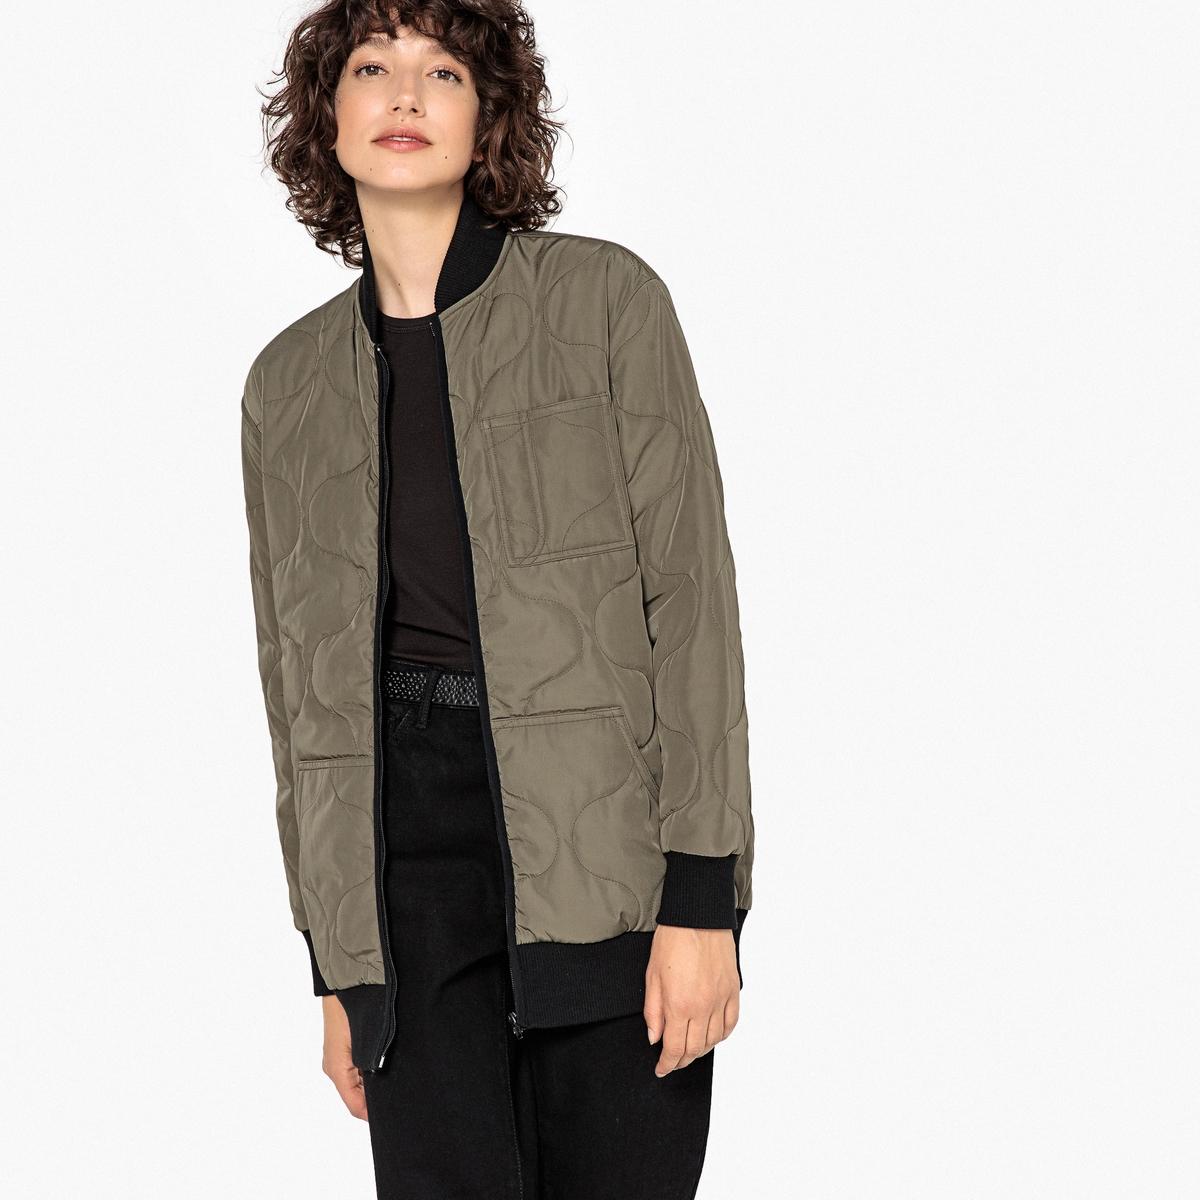 Steppjacke mit Reissverschluss   Bekleidung > Jacken > Daunenjacken & Steppjacken   Polyester   La Redoute Collections